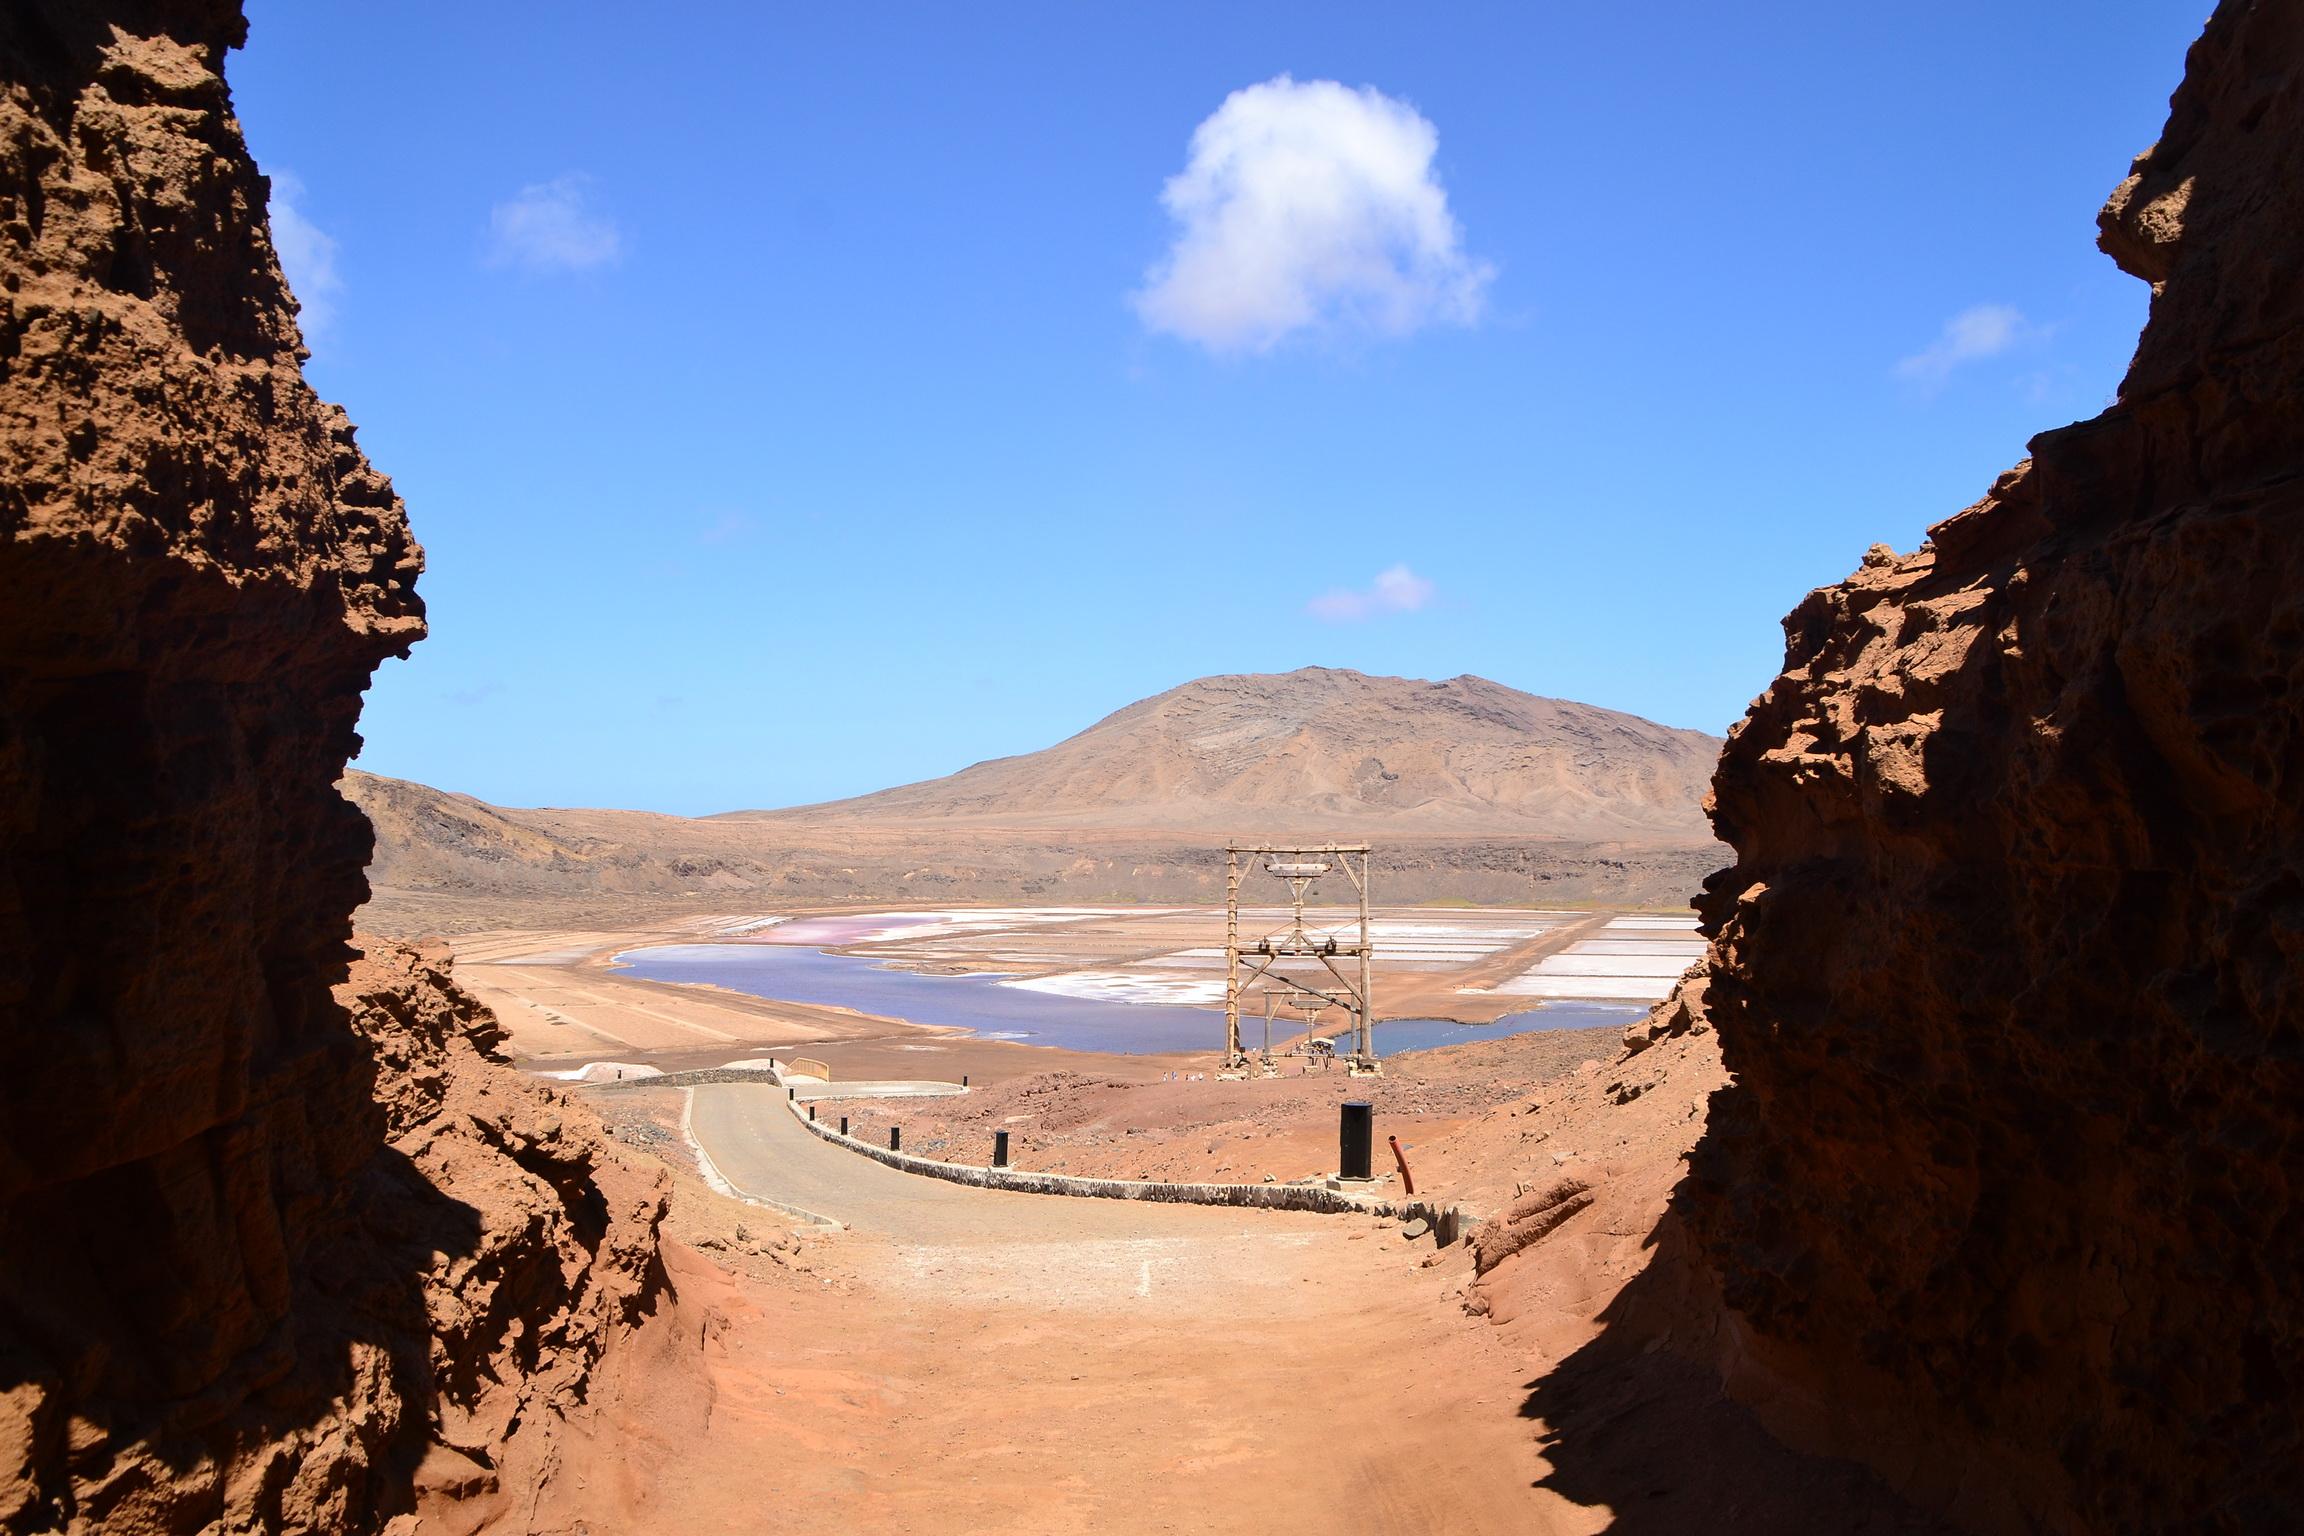 Pedra de Lume salt crater